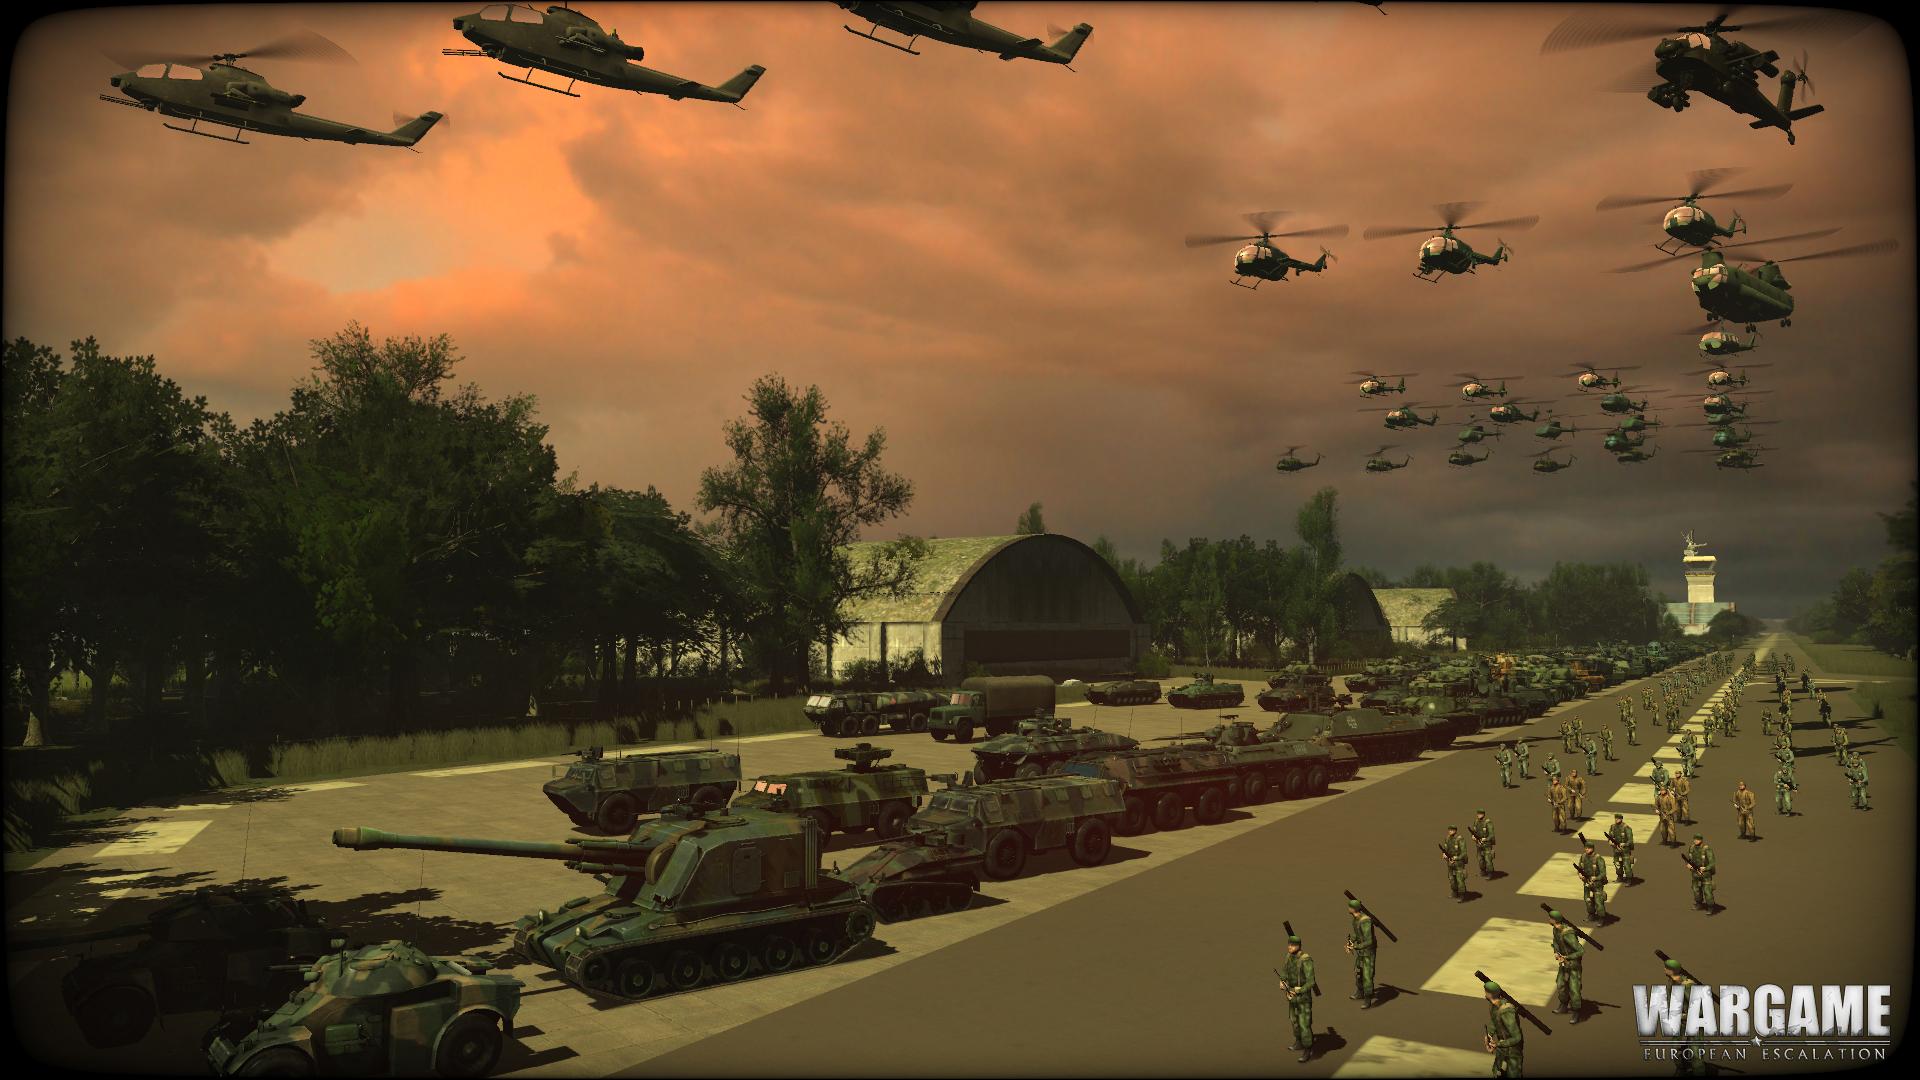 Obrázky z Wargame: European Escalation 59297